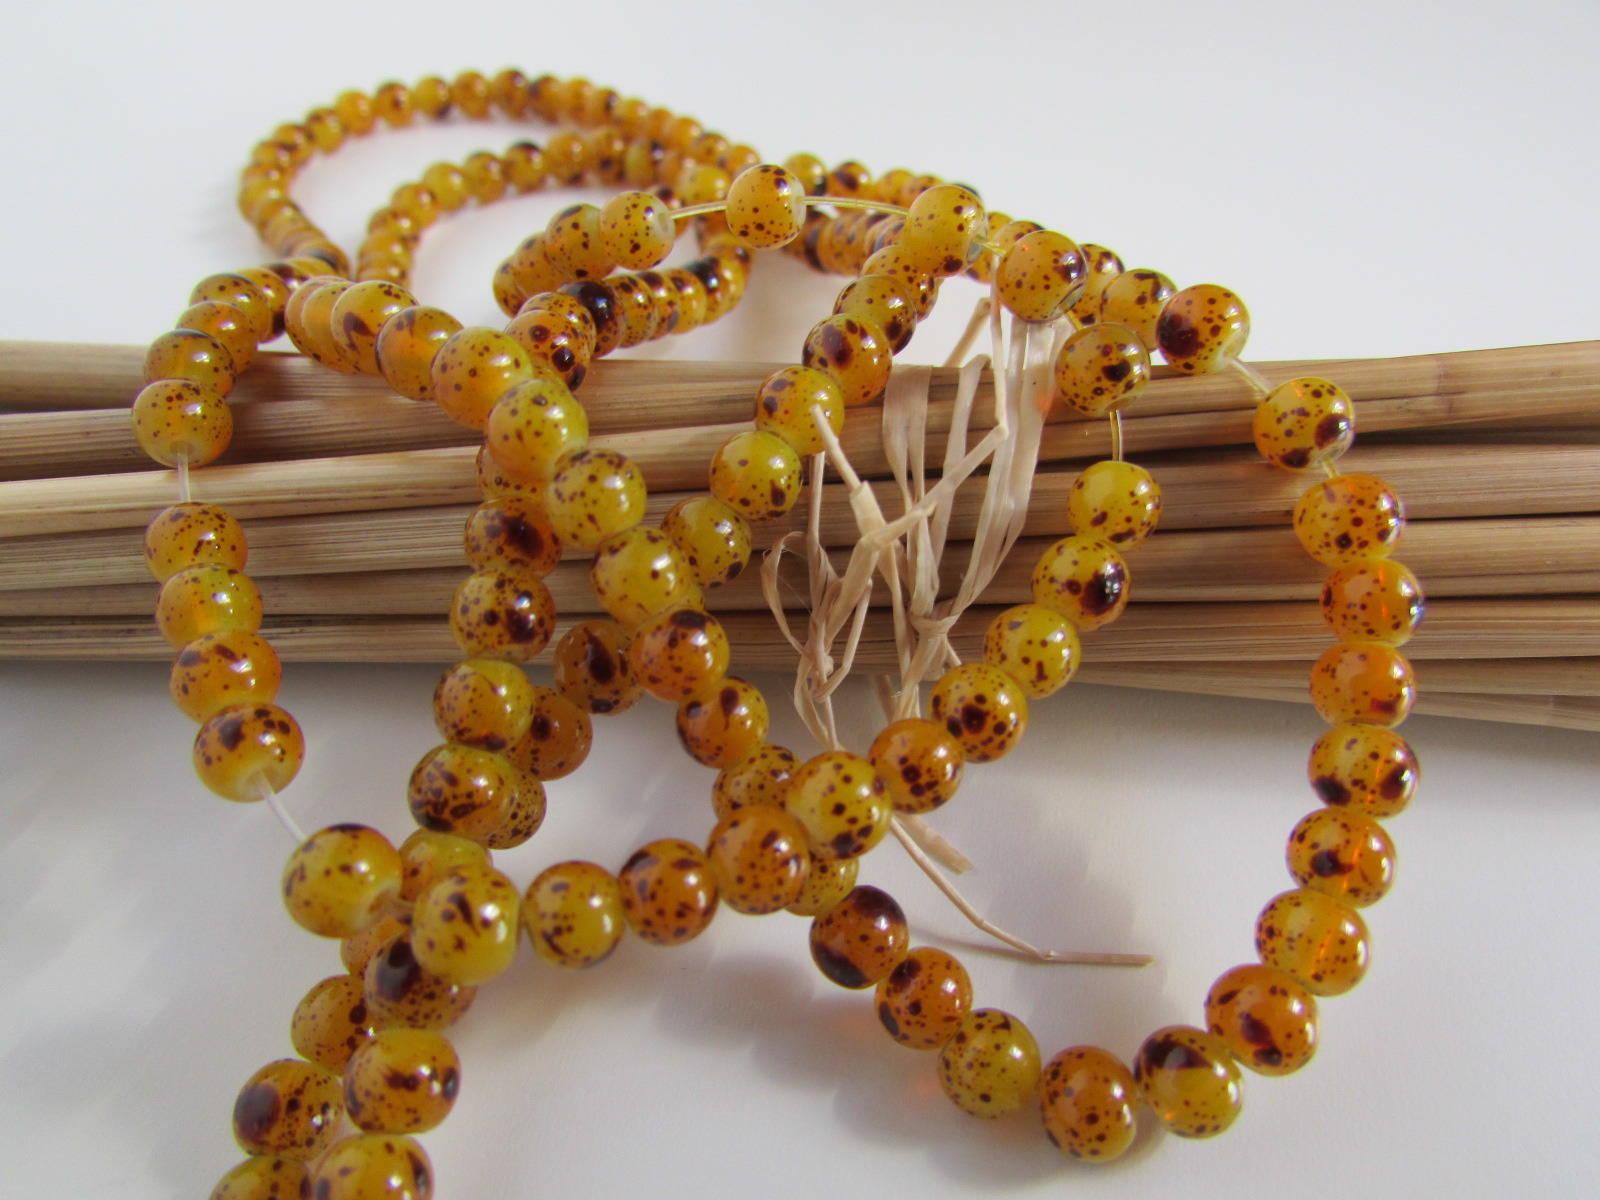 50 perles 4 mm en verre - jaune ocre zébré brun - trou 1 mm - ref 60.34